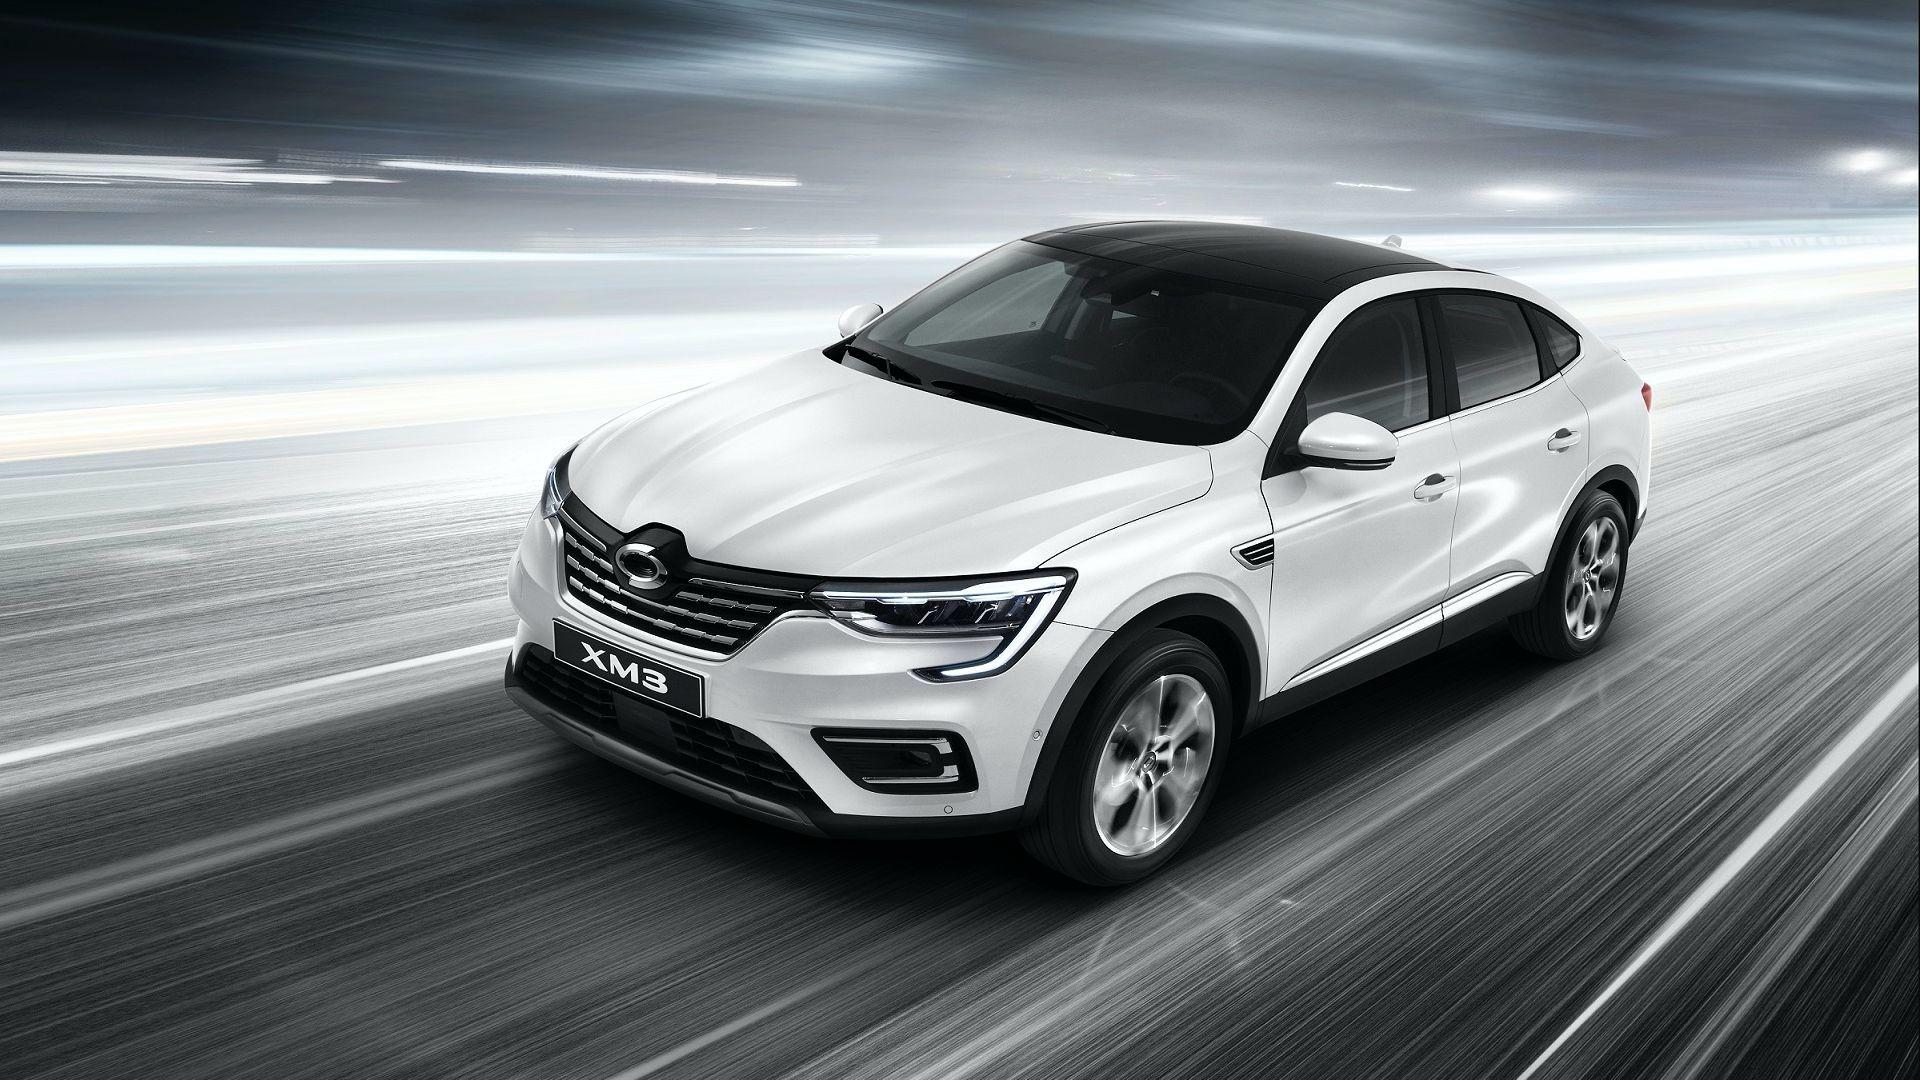 Renault_Samsung_XM3_0001